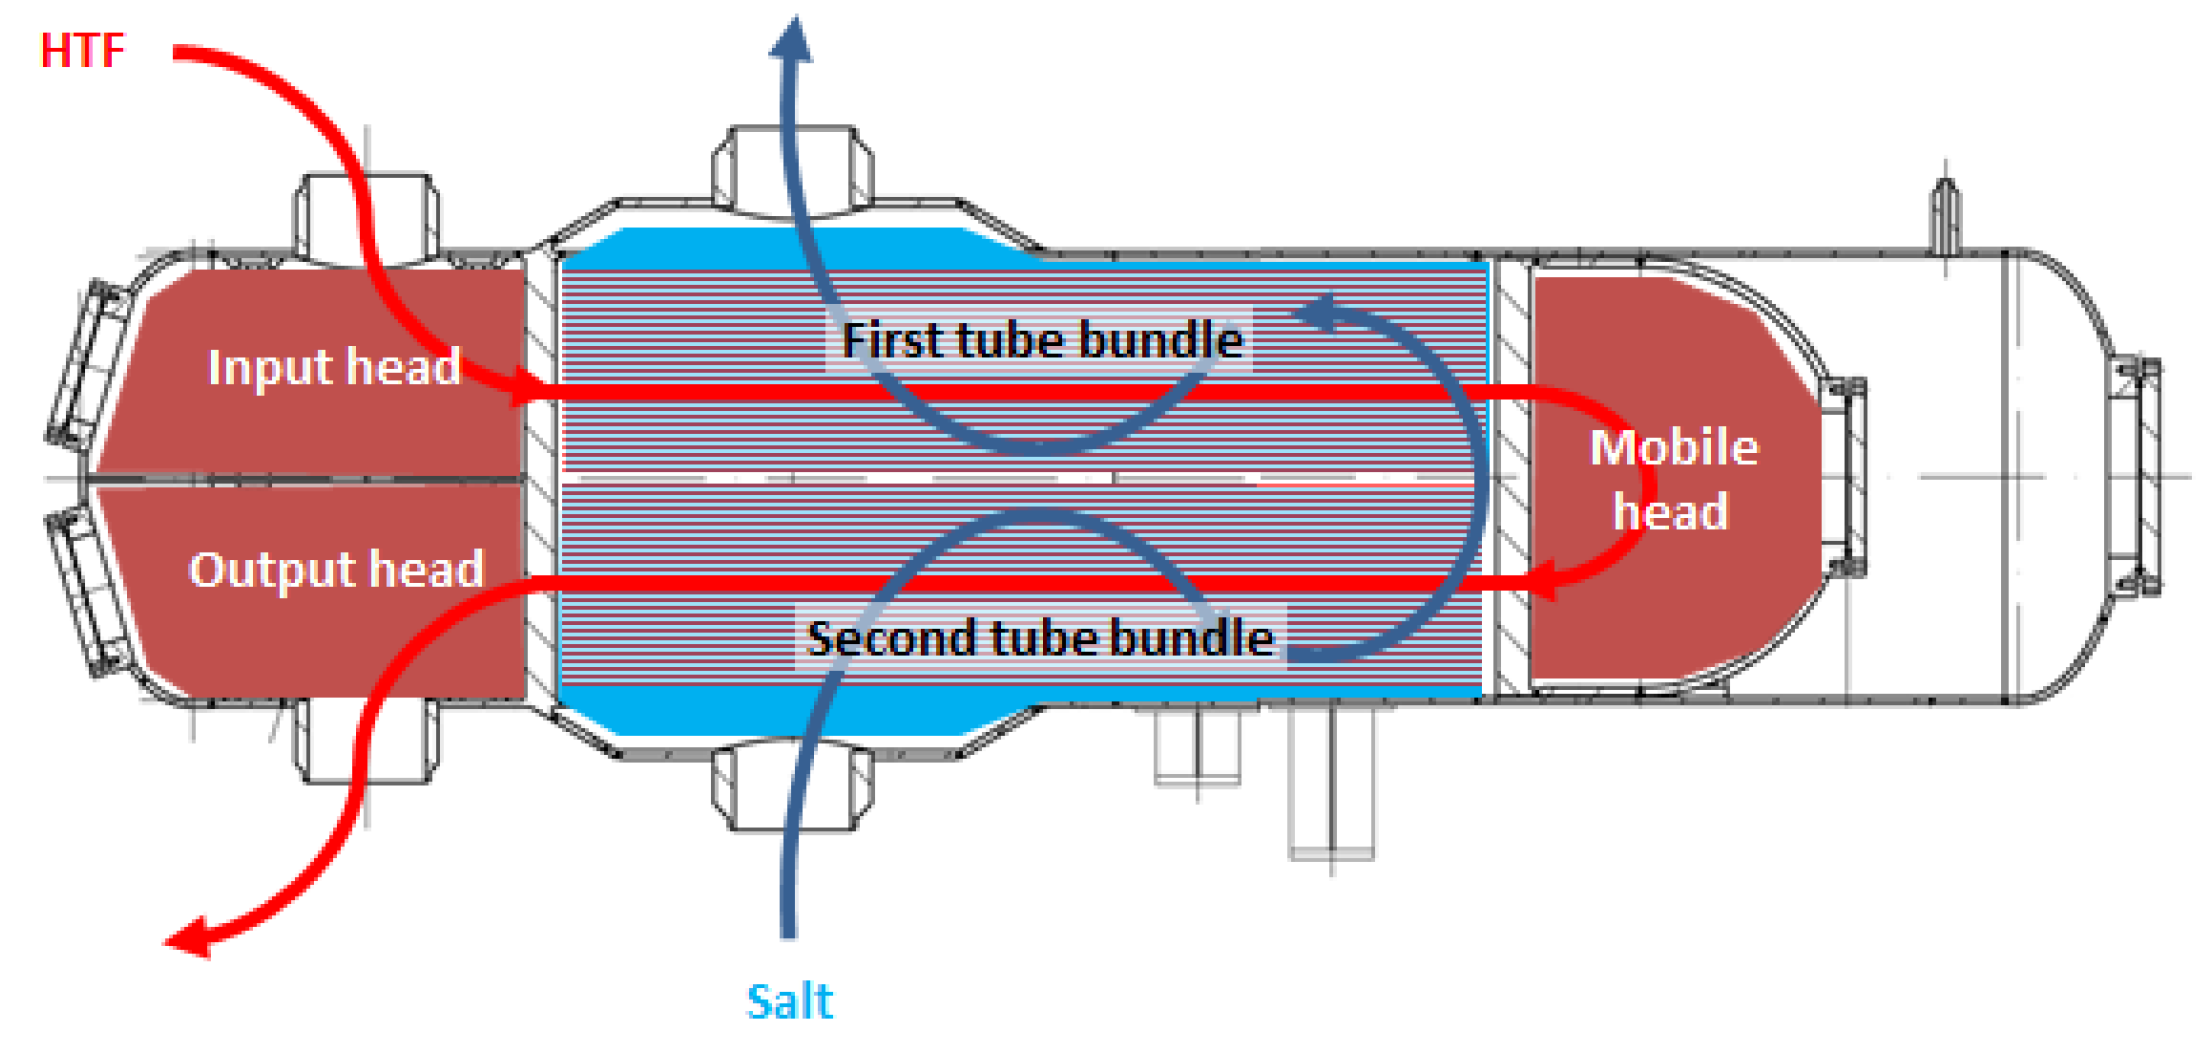 Energies Free Full Text A Novel Modeling Of Molten Salt Heat Block Diagram Exchanger 07 06721 G008 1024